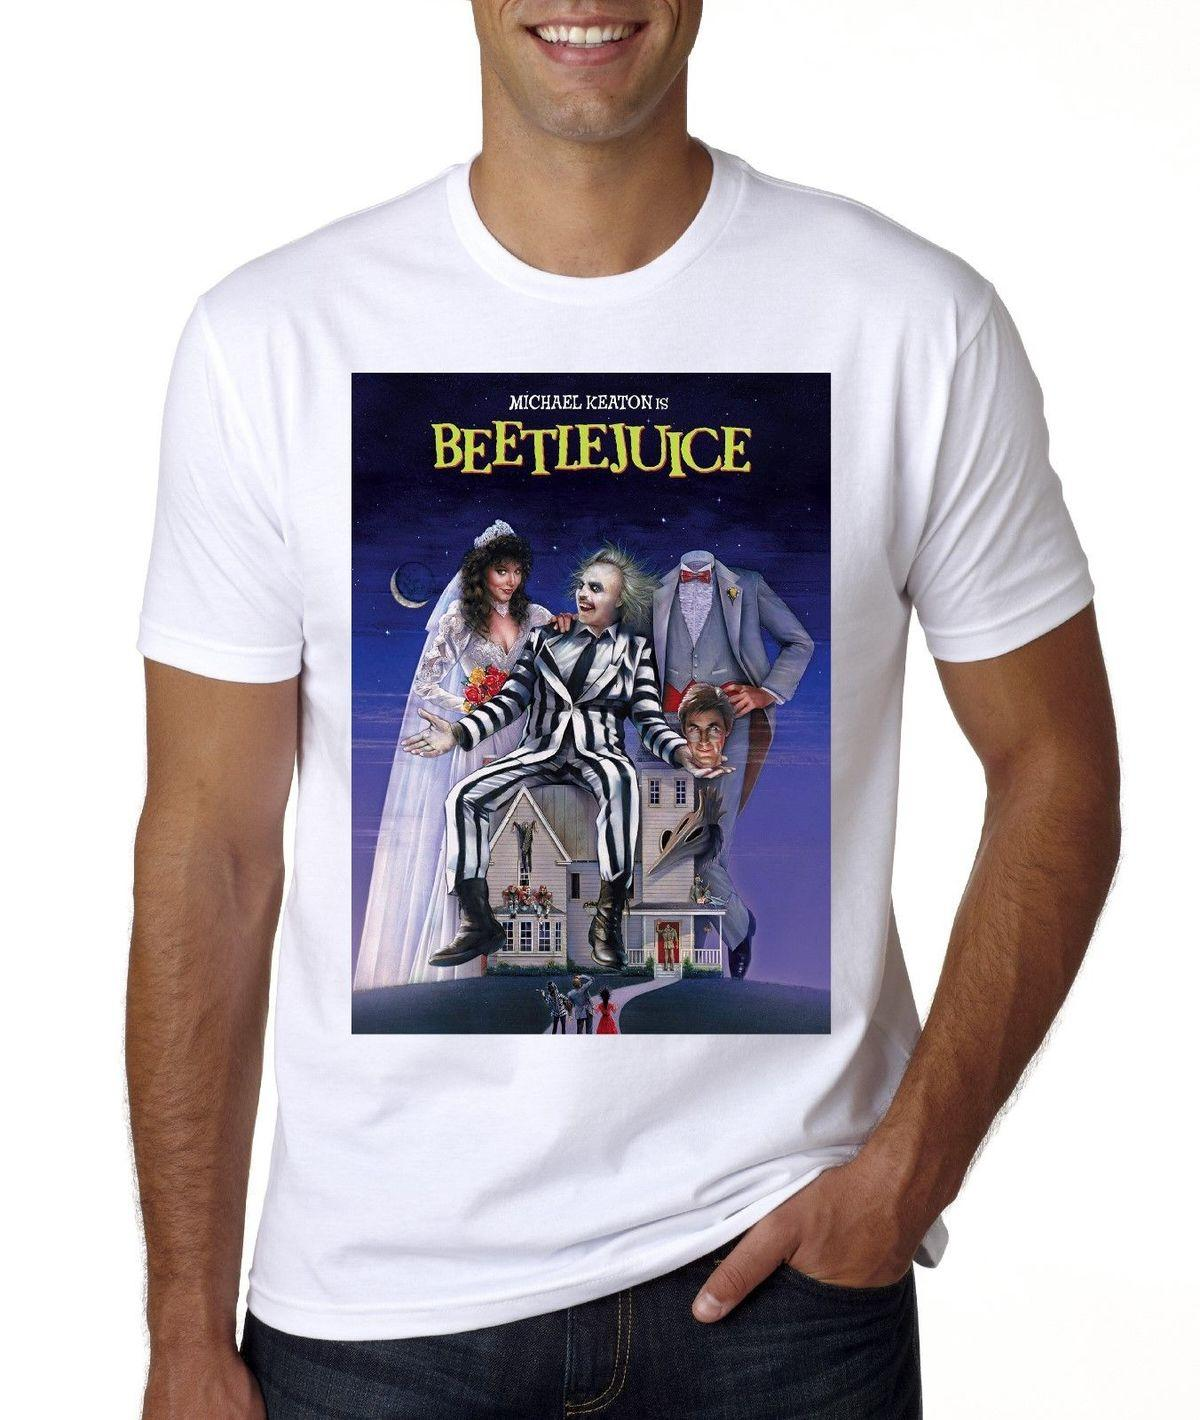 Design Your Own T Shirt Online Australia Rockwall Auction